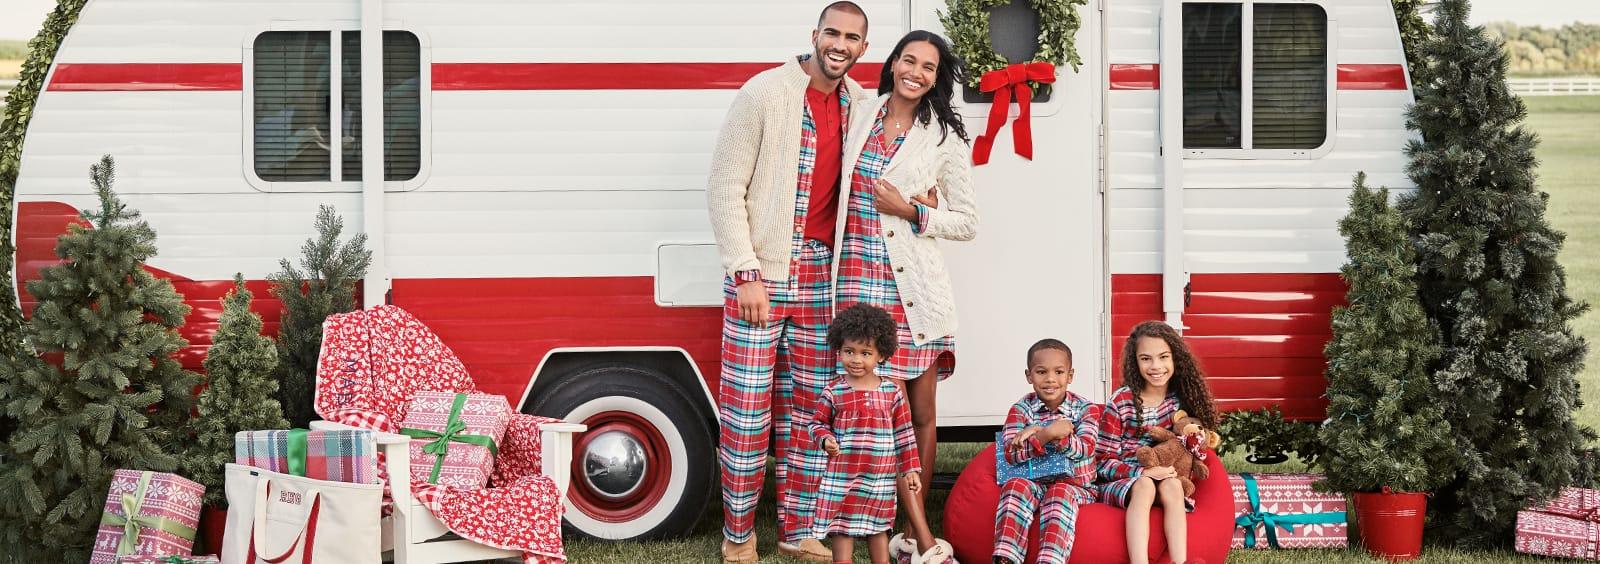 Matching Family Christmas Pajamas for Every Home Video